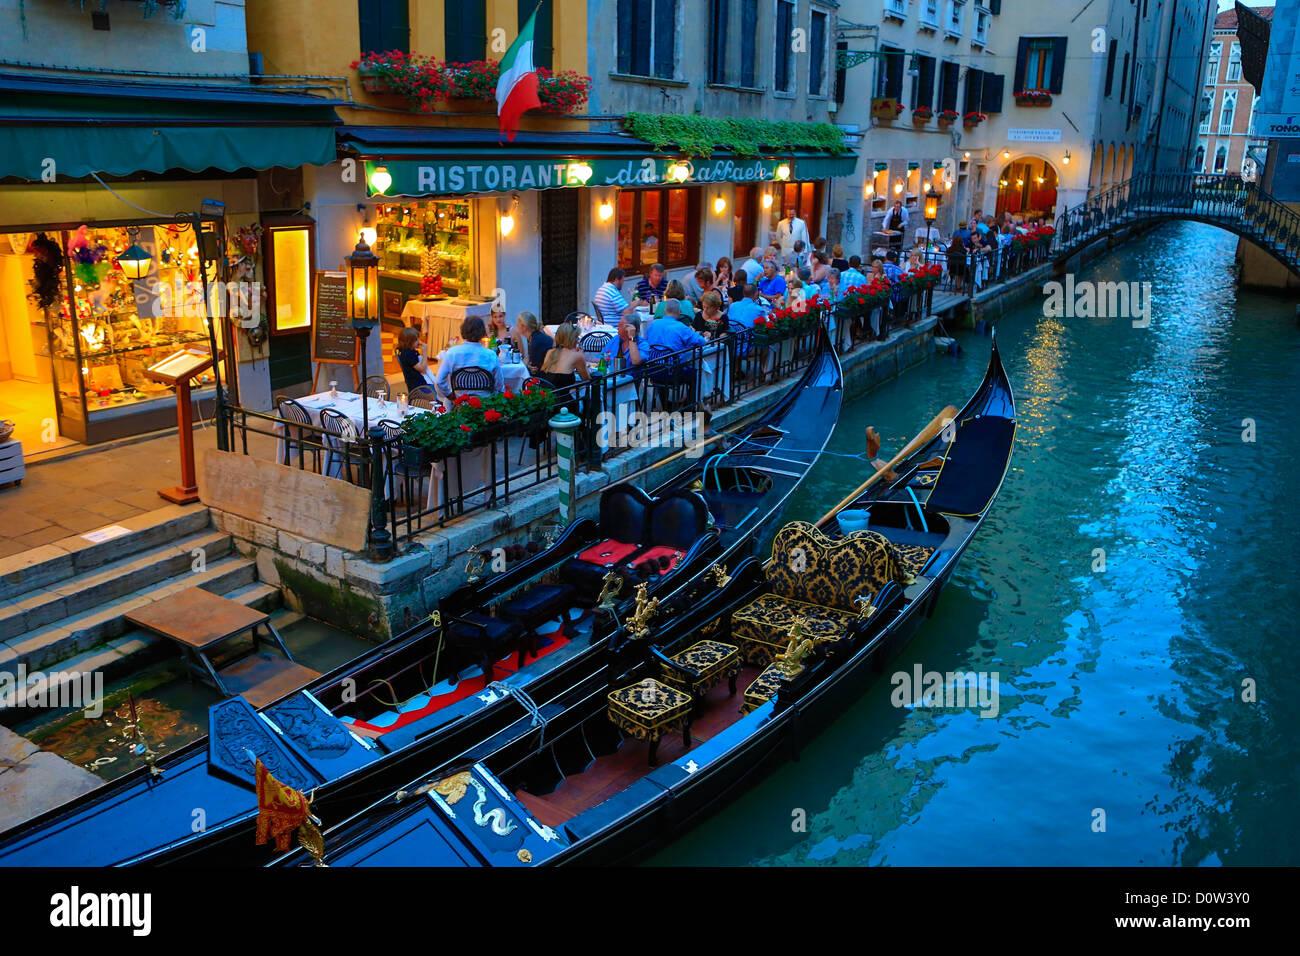 Italy, Europe, travel, Venice, Terrace, gondolas, Italy, Europe, travel, architecture, canal, evening, gondolas, - Stock Image